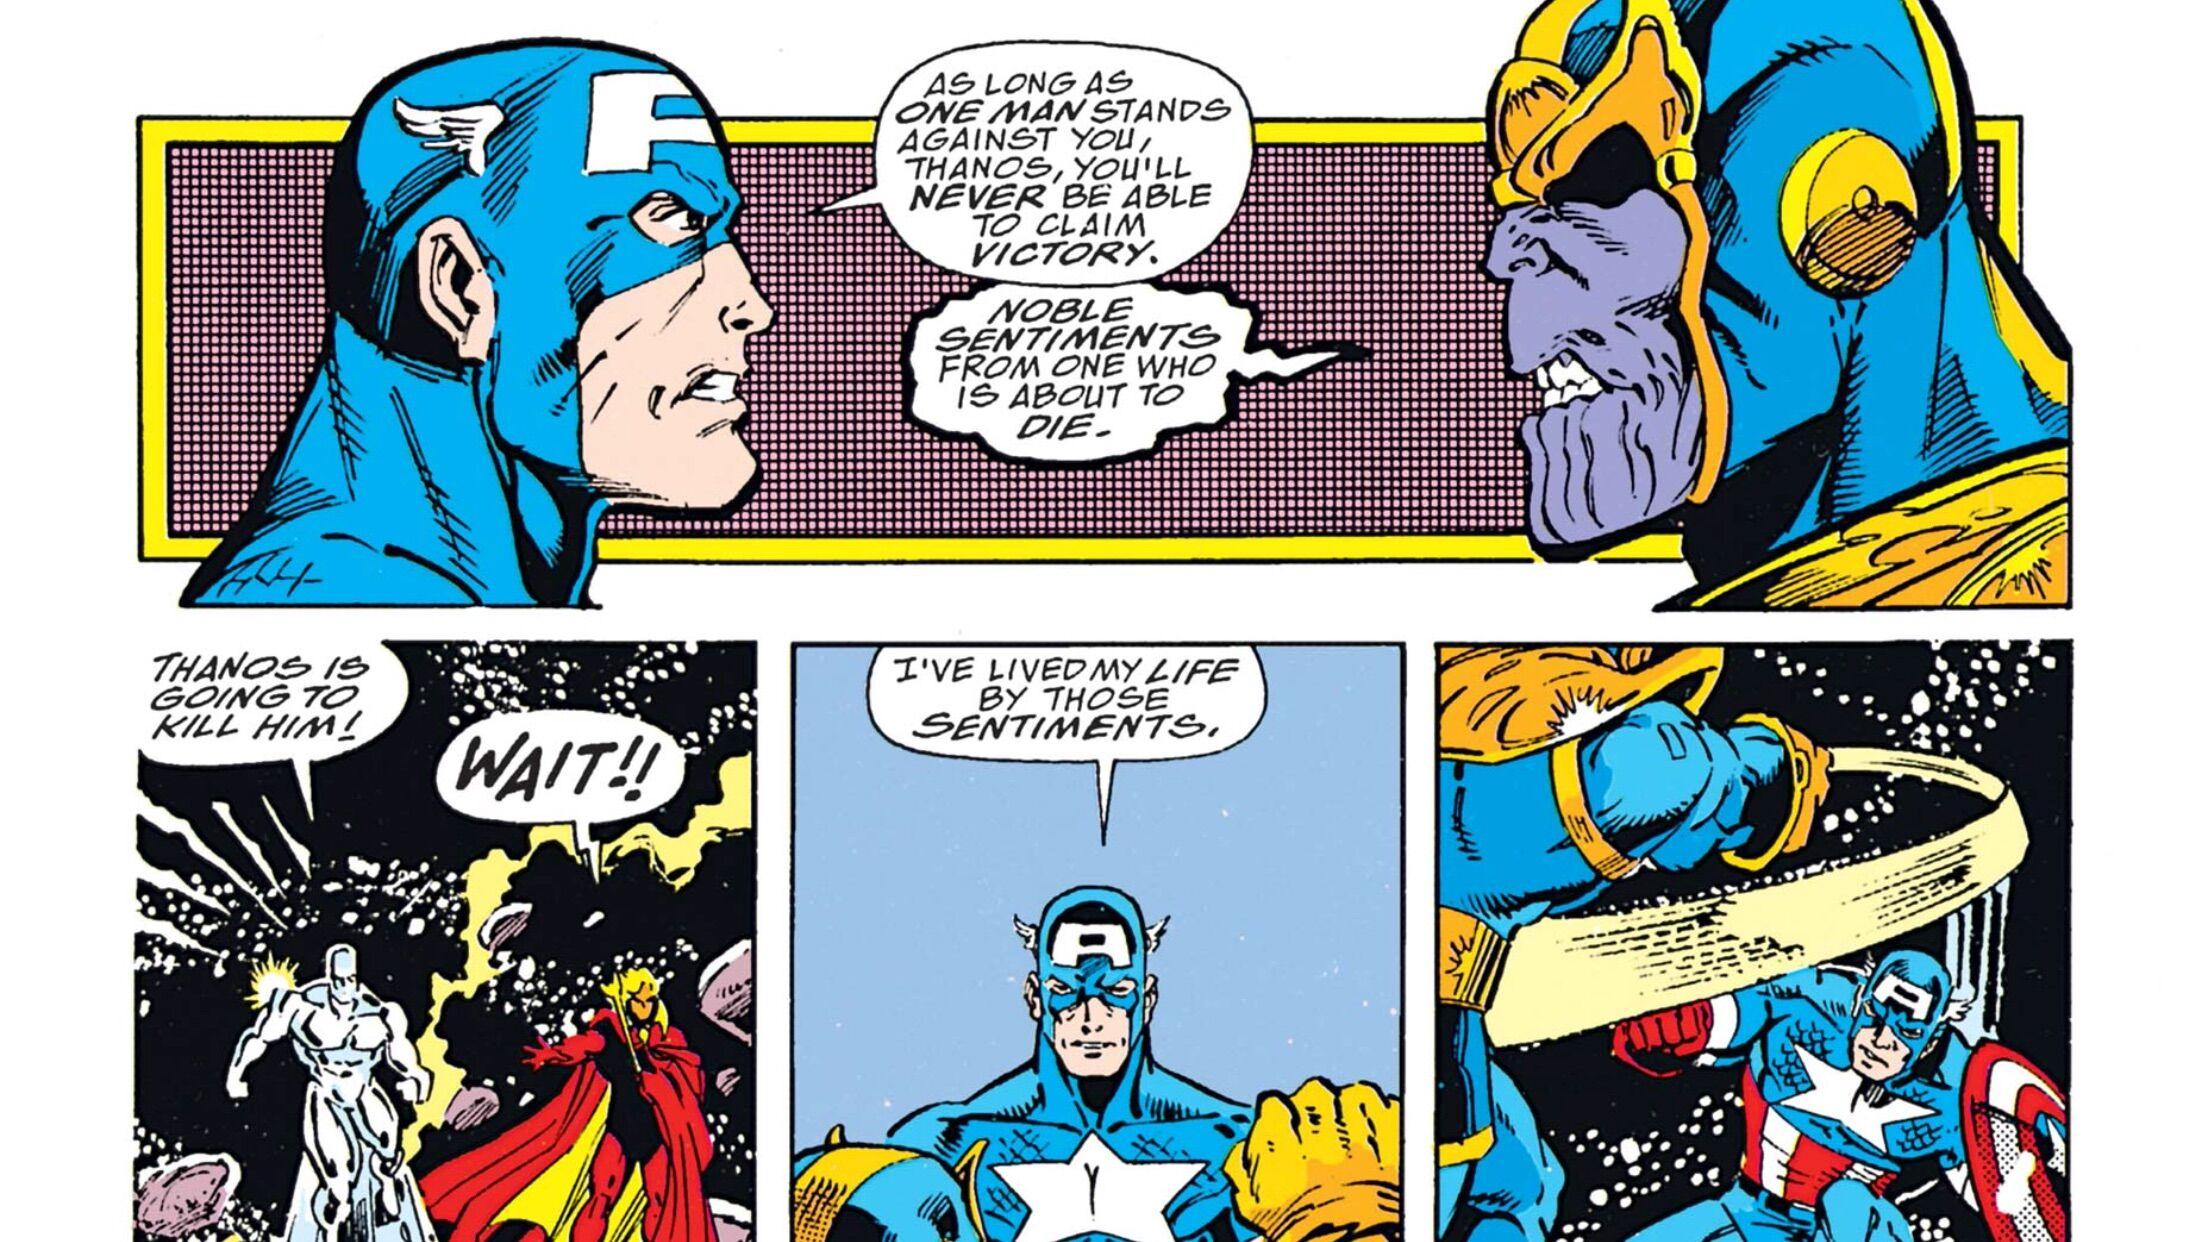 Captain America Battling Thanos In Avengers Infinity War Has Comic Ties